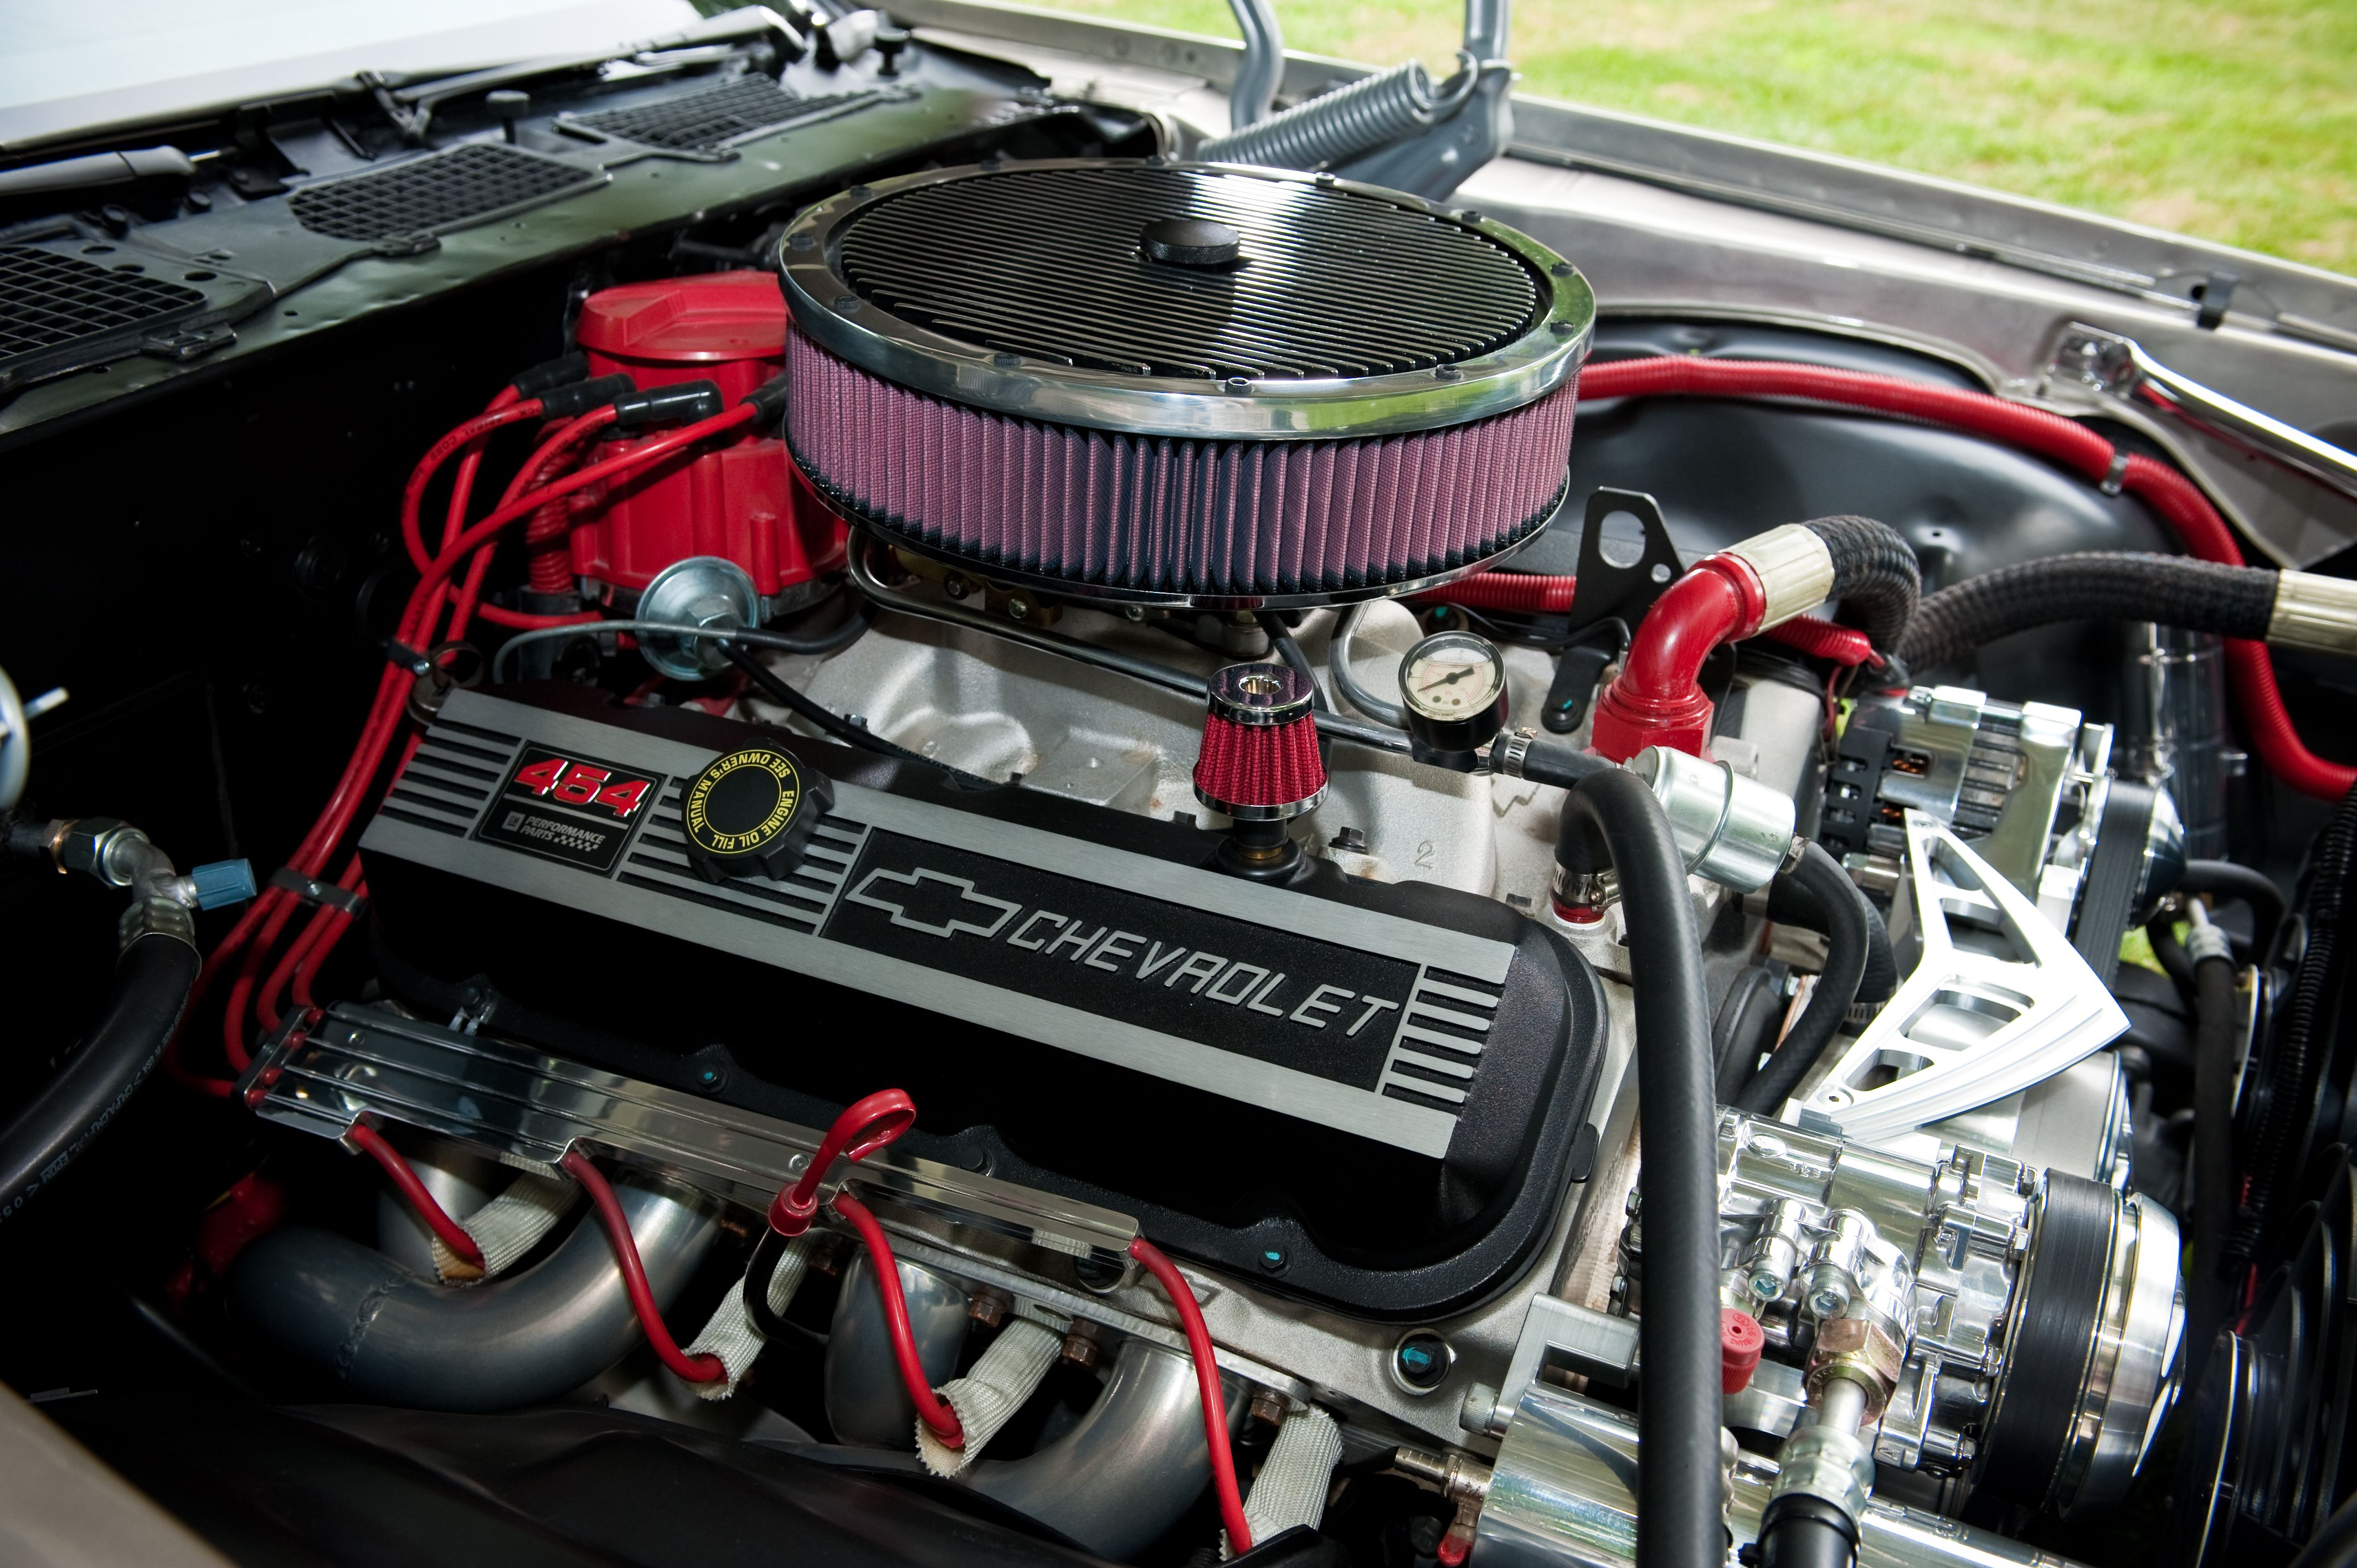 Zz 454 Gm Performance Engine Performance Engines Car Engine Chevy